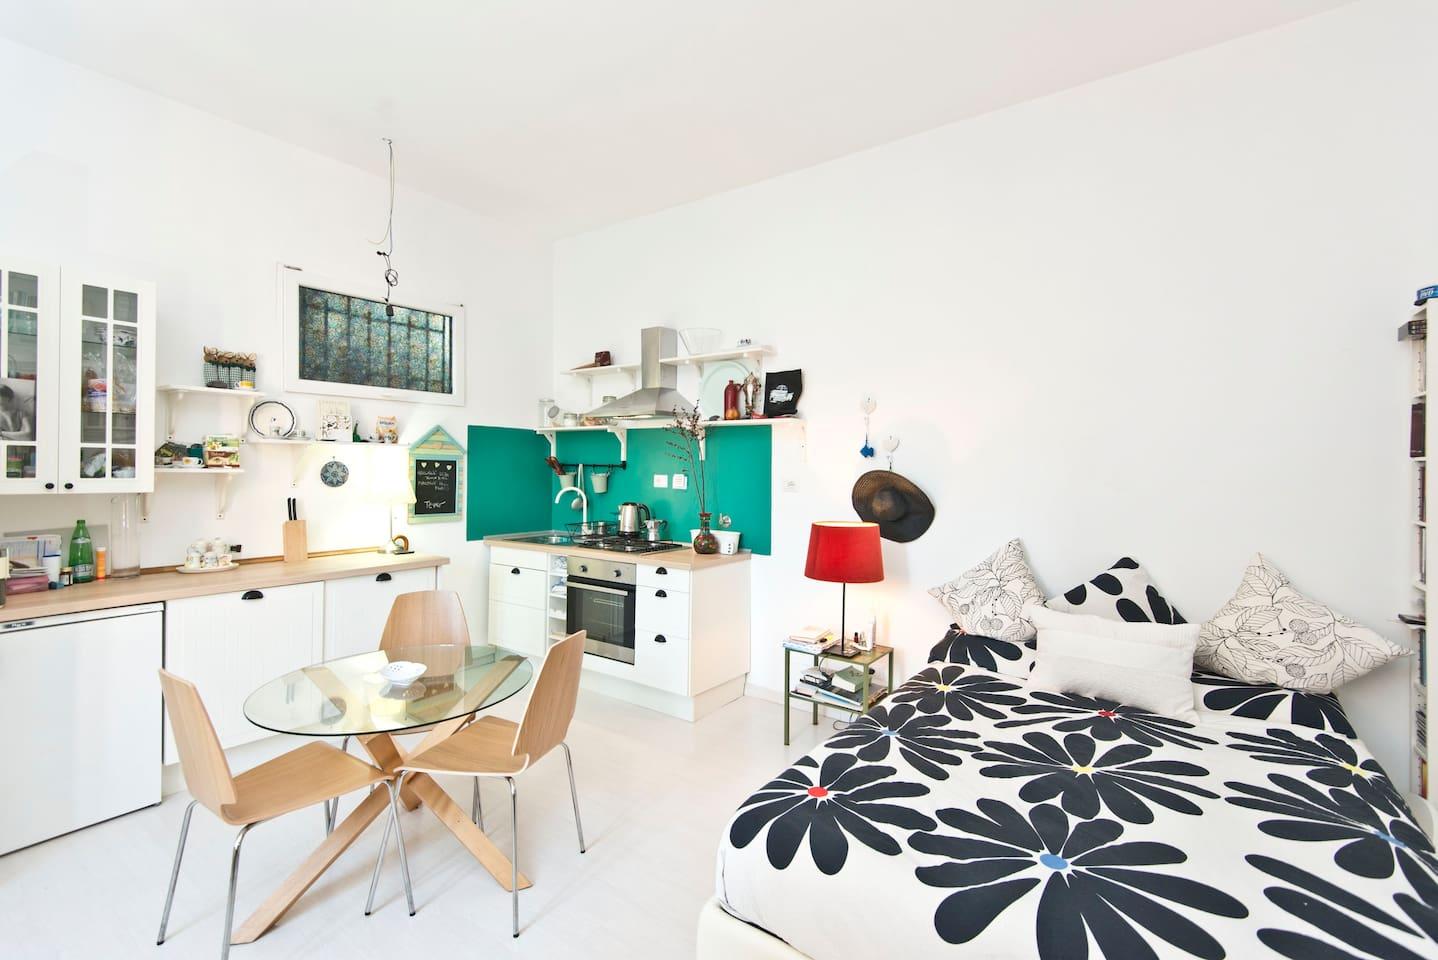 Cozy flat in cozy neighborhood